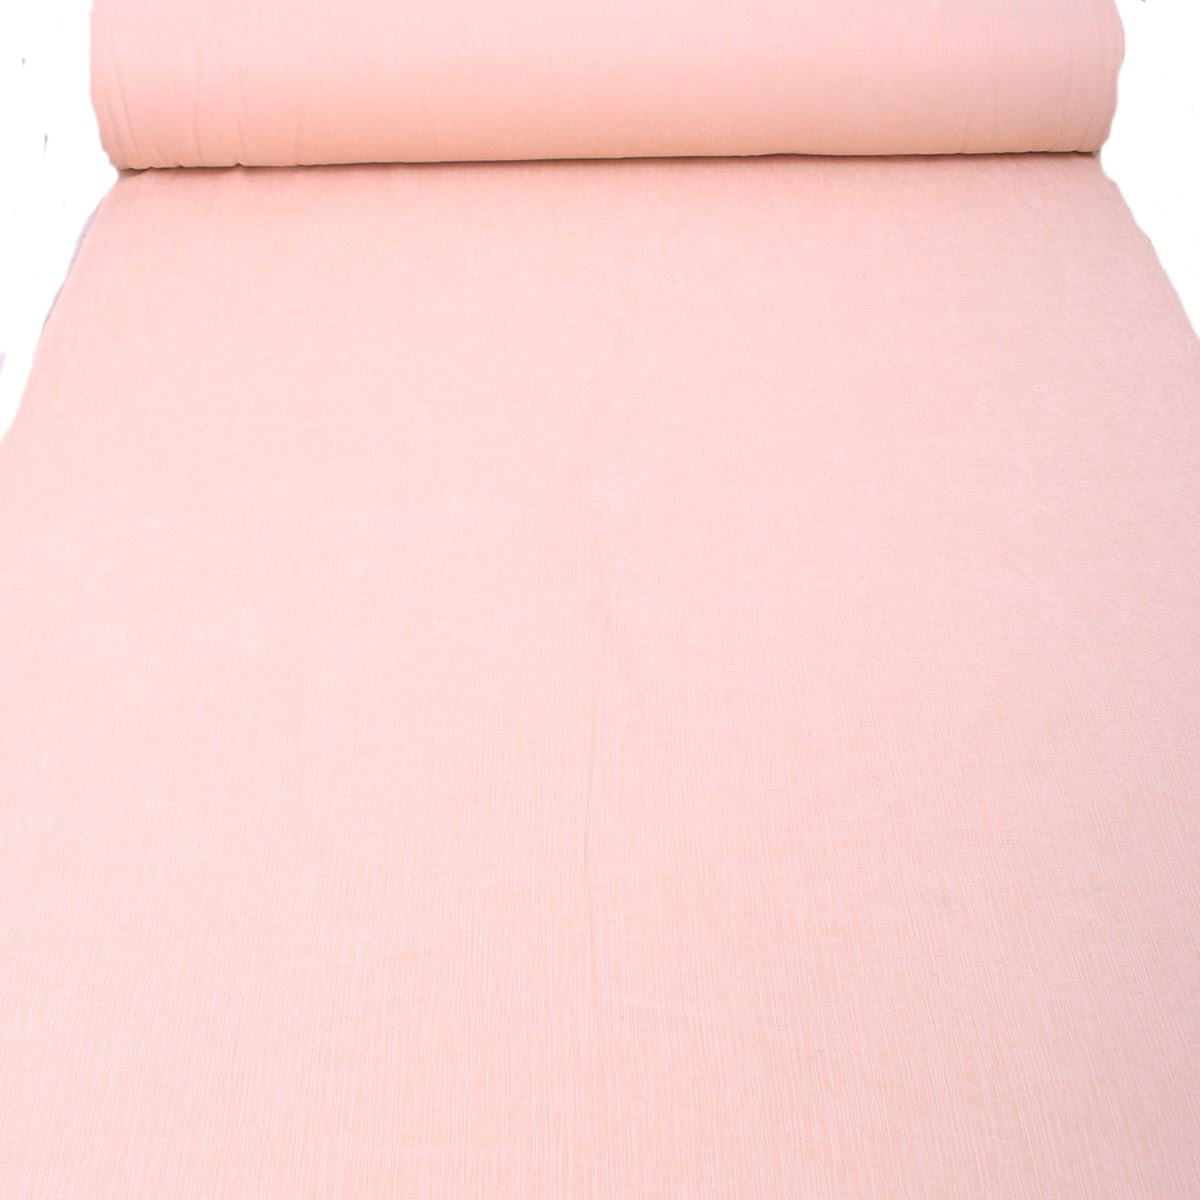 034-Chenille-034-Slubbed-Shabby-Worn-Look-Curtain-Cushion-Sofa-Upholstery-Fabric thumbnail 32